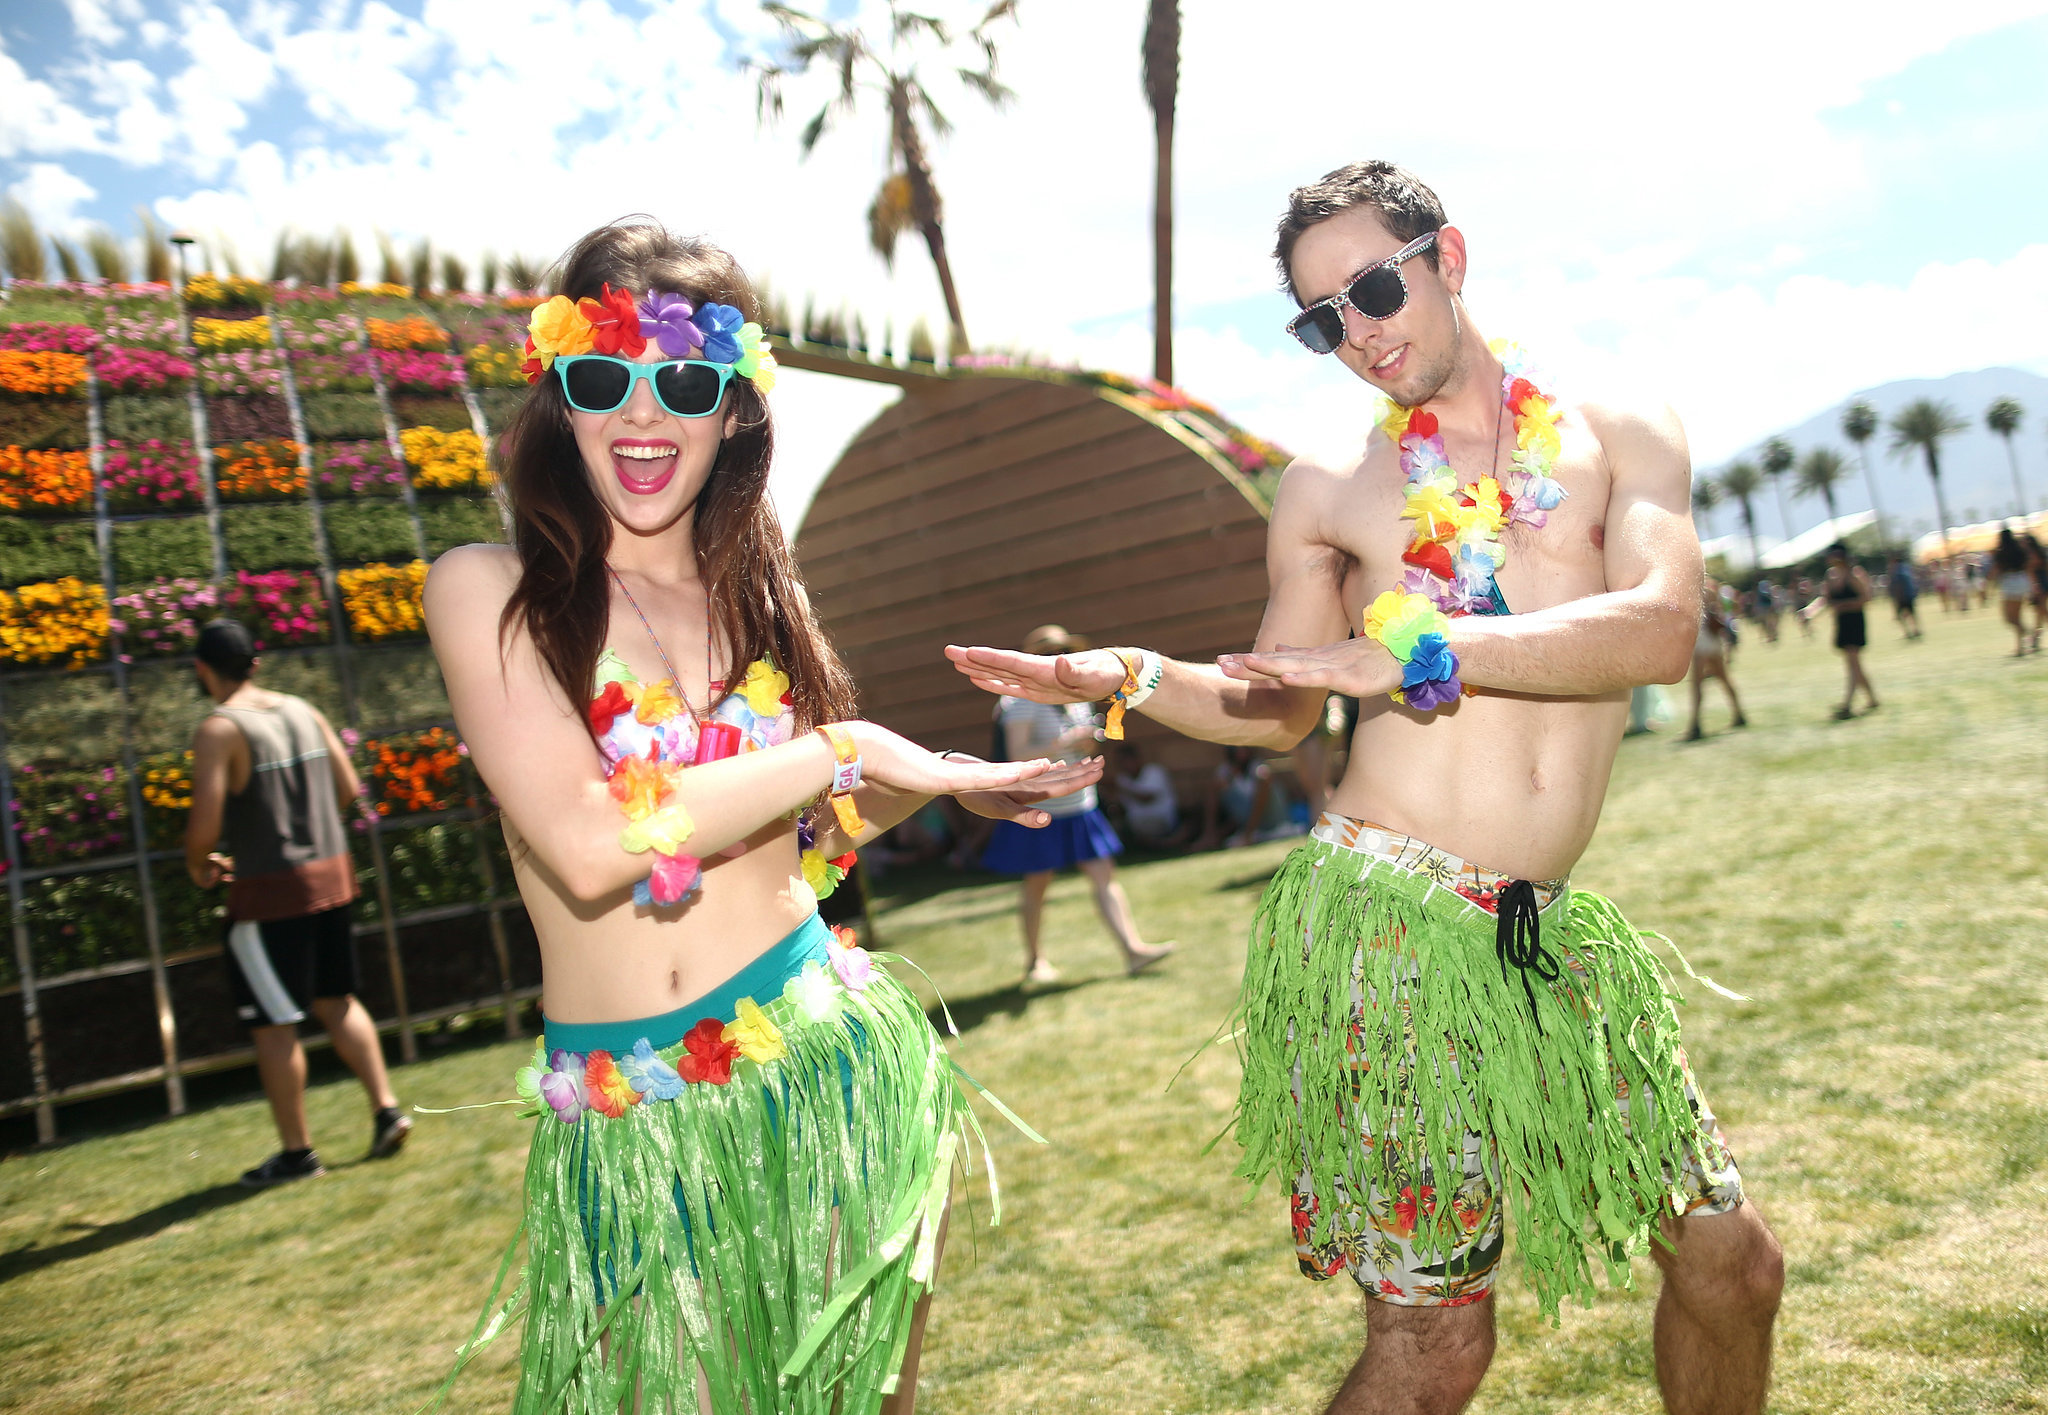 A couple hula danced in their Hawaii-inspired Coachella wear.